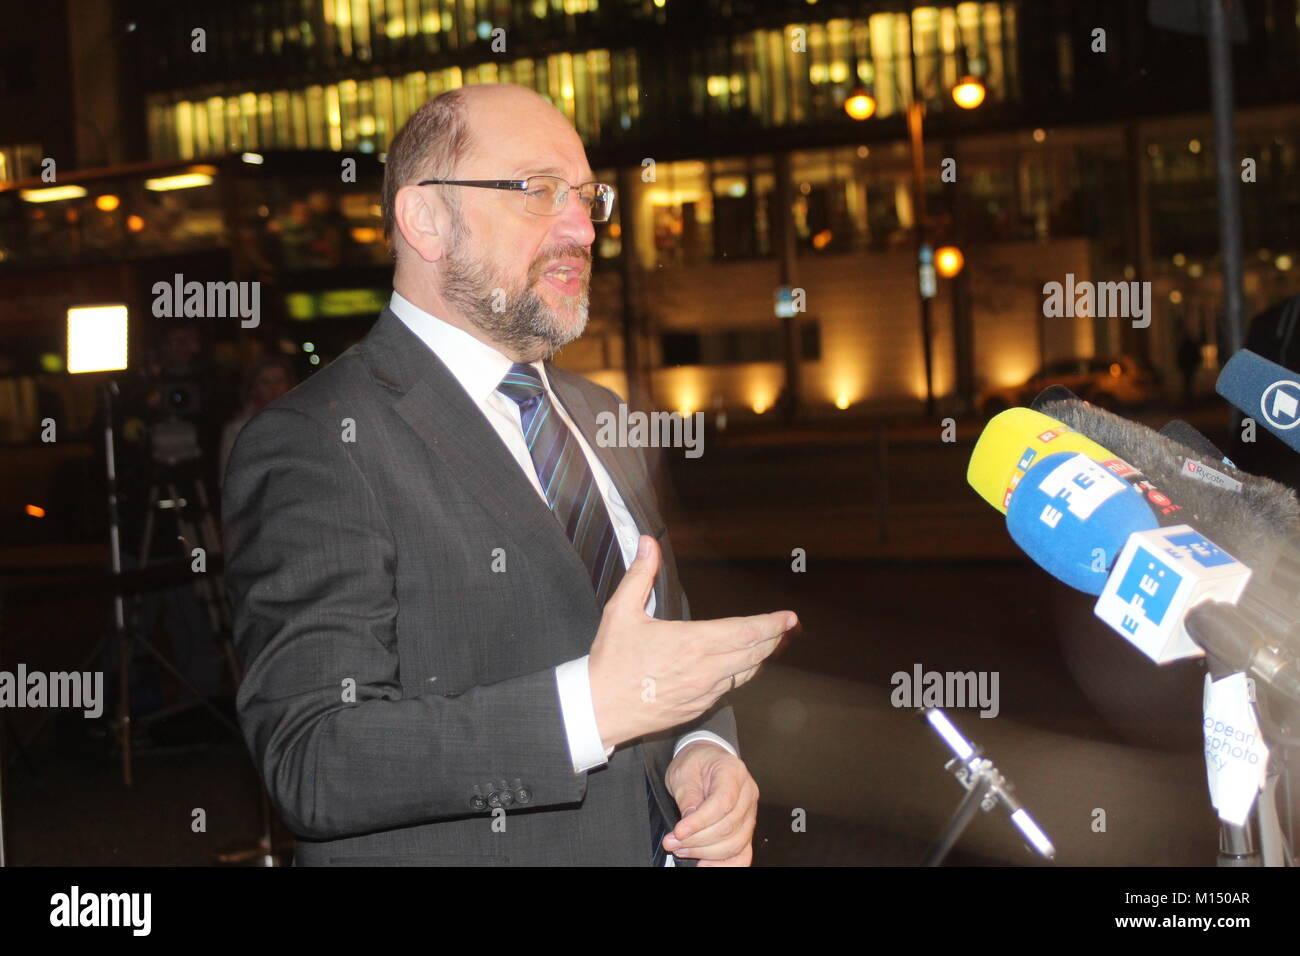 Martin Schulz - Stock Image